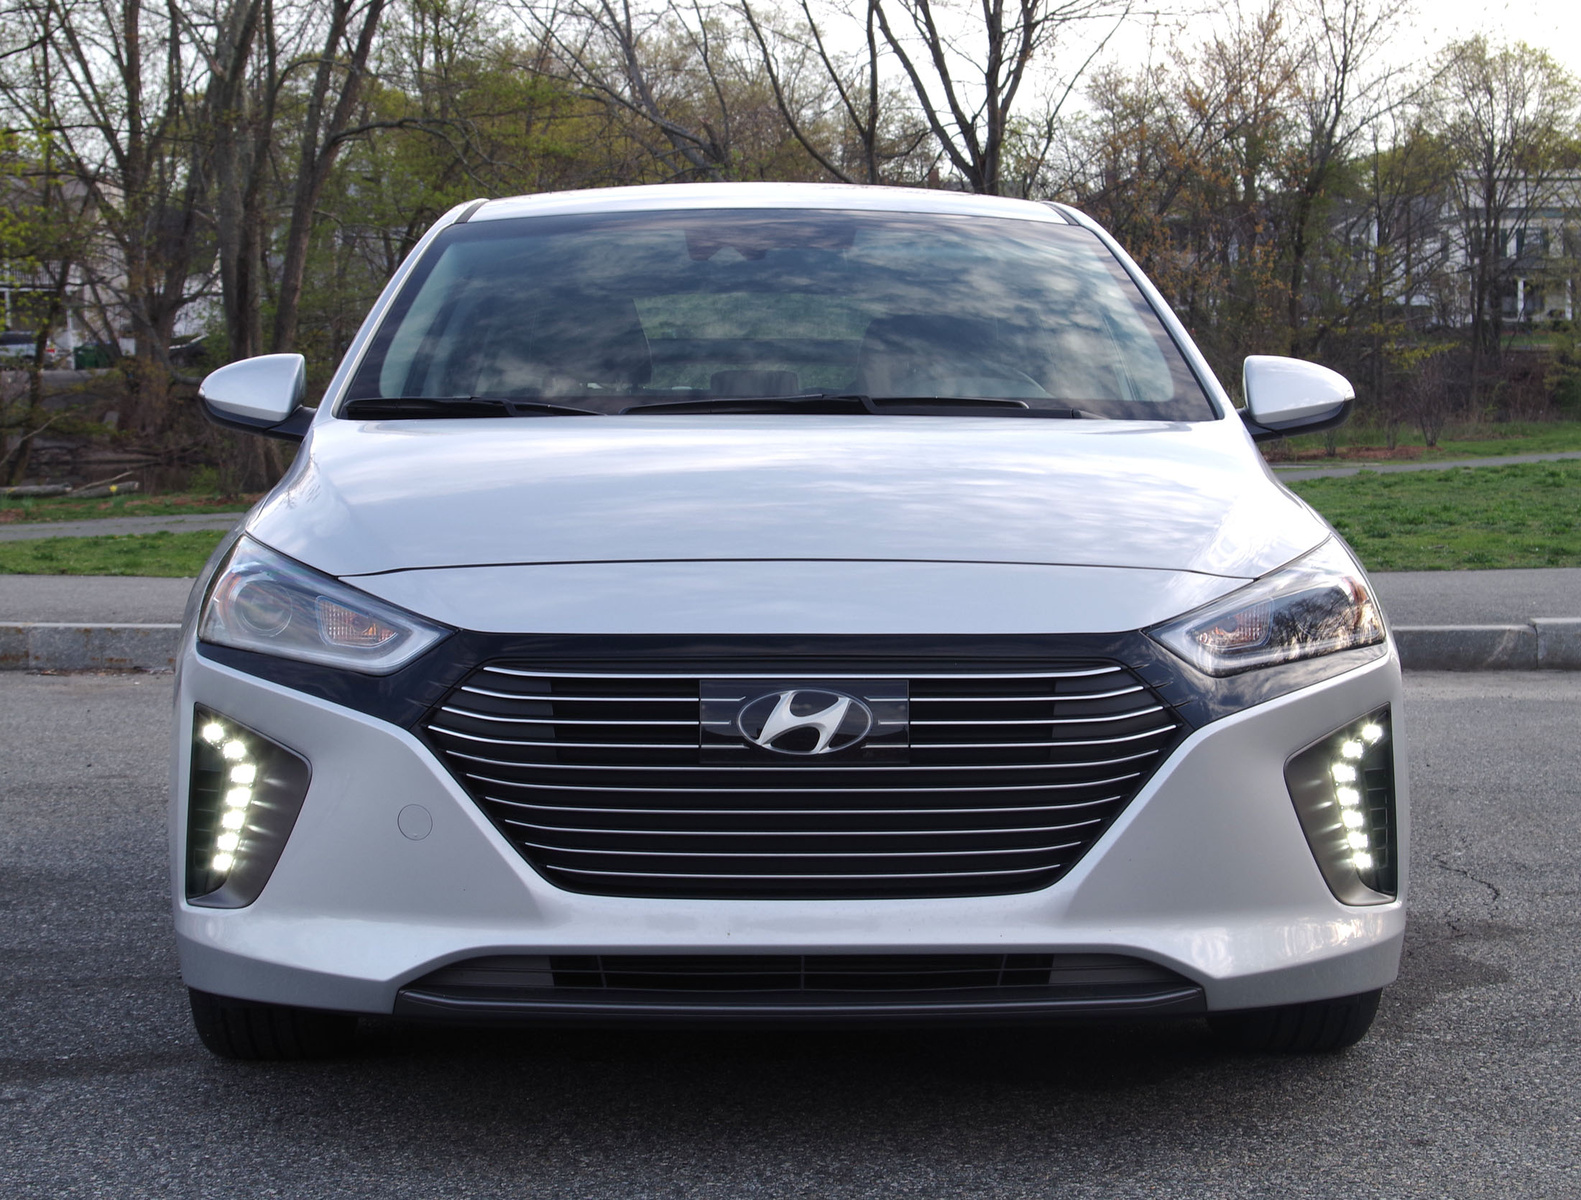 2017 Hyundai Ioniq front view